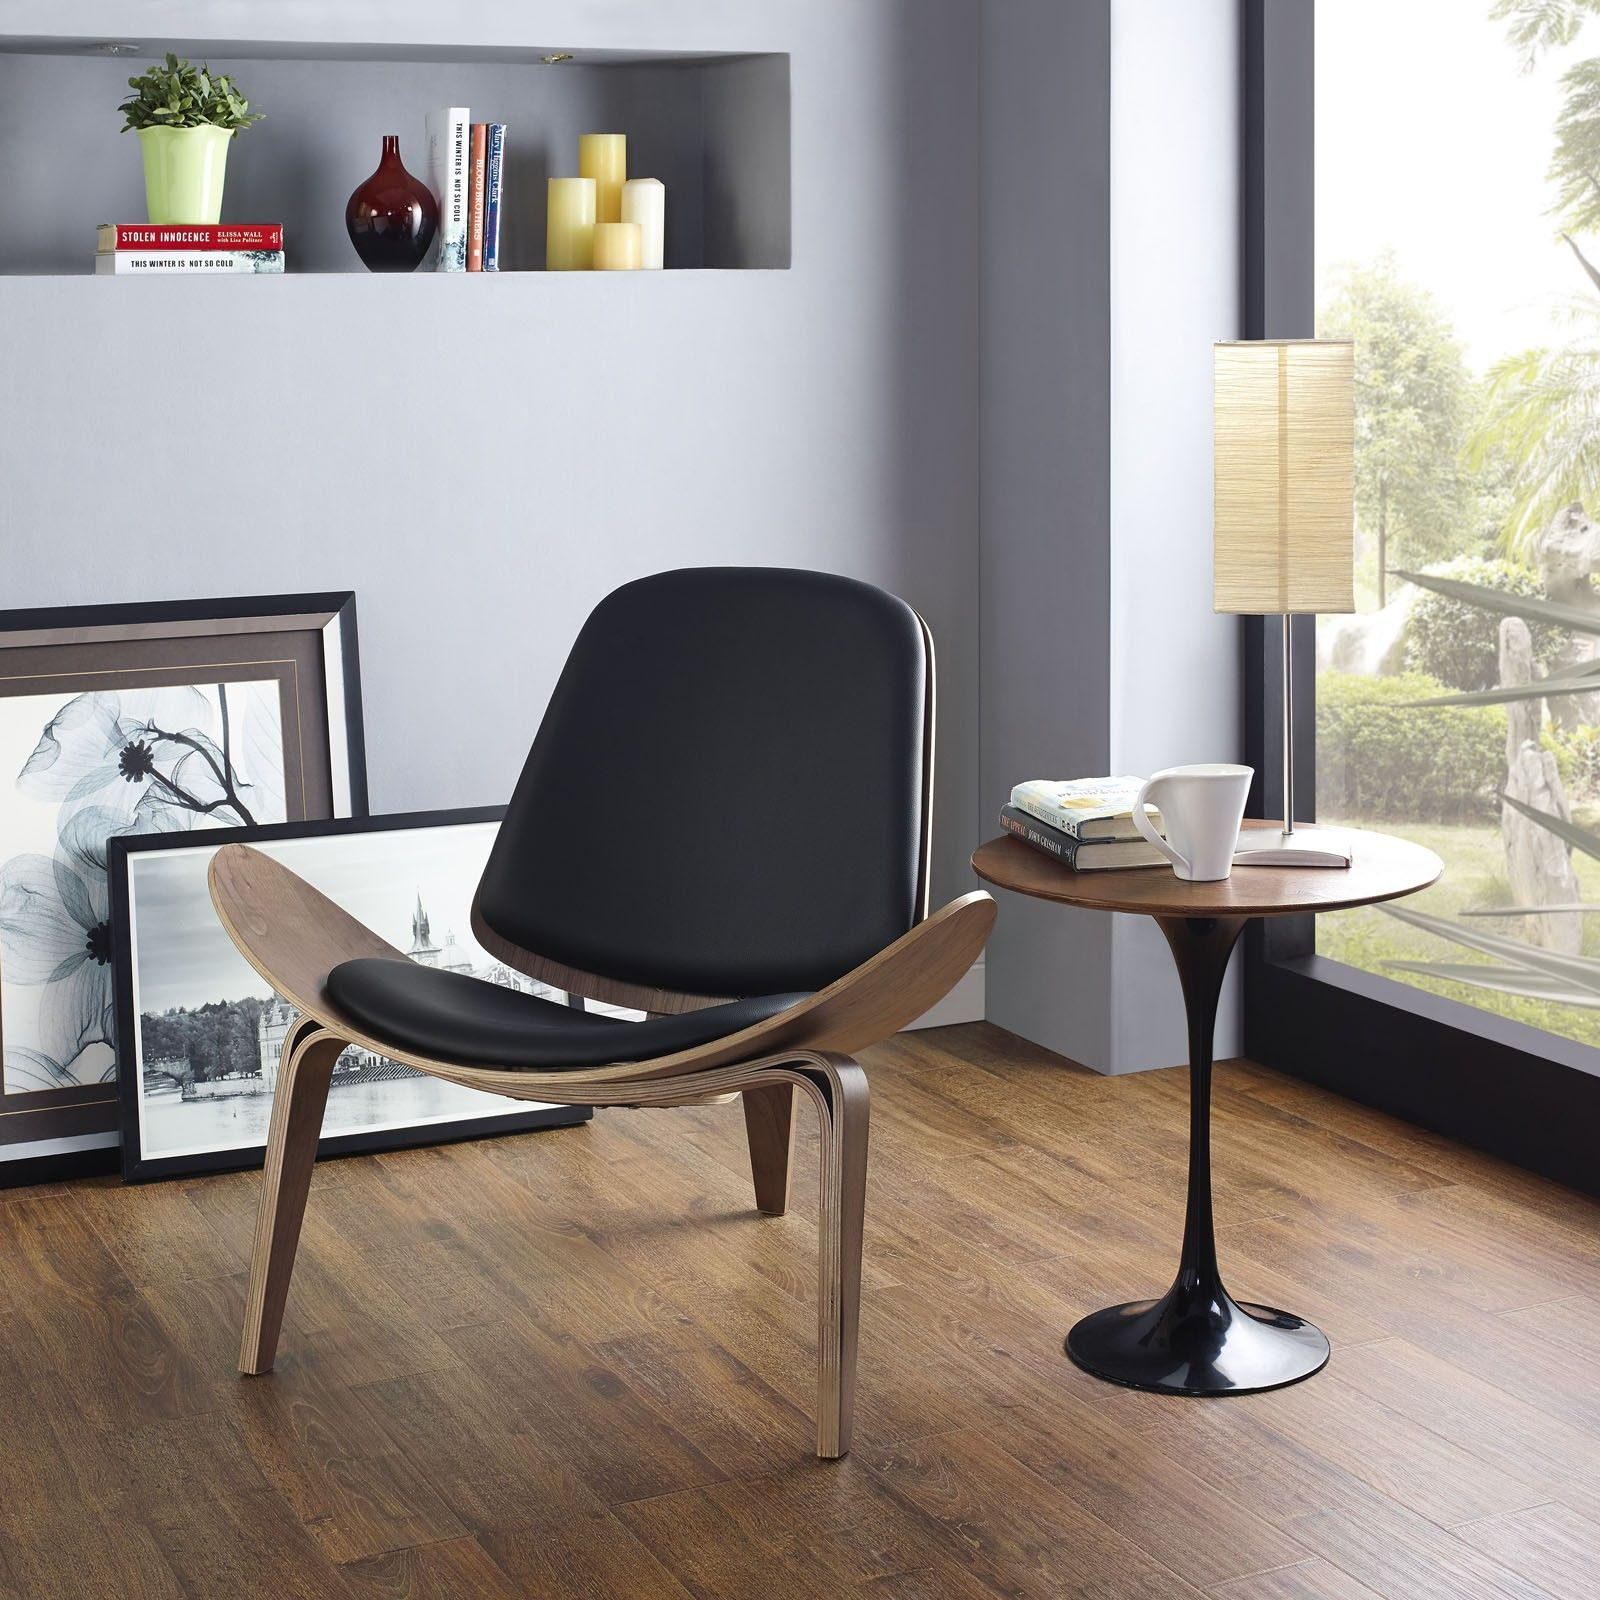 hans_j._wegner_shell_chair_ch07_black.jpg (1600×1600)